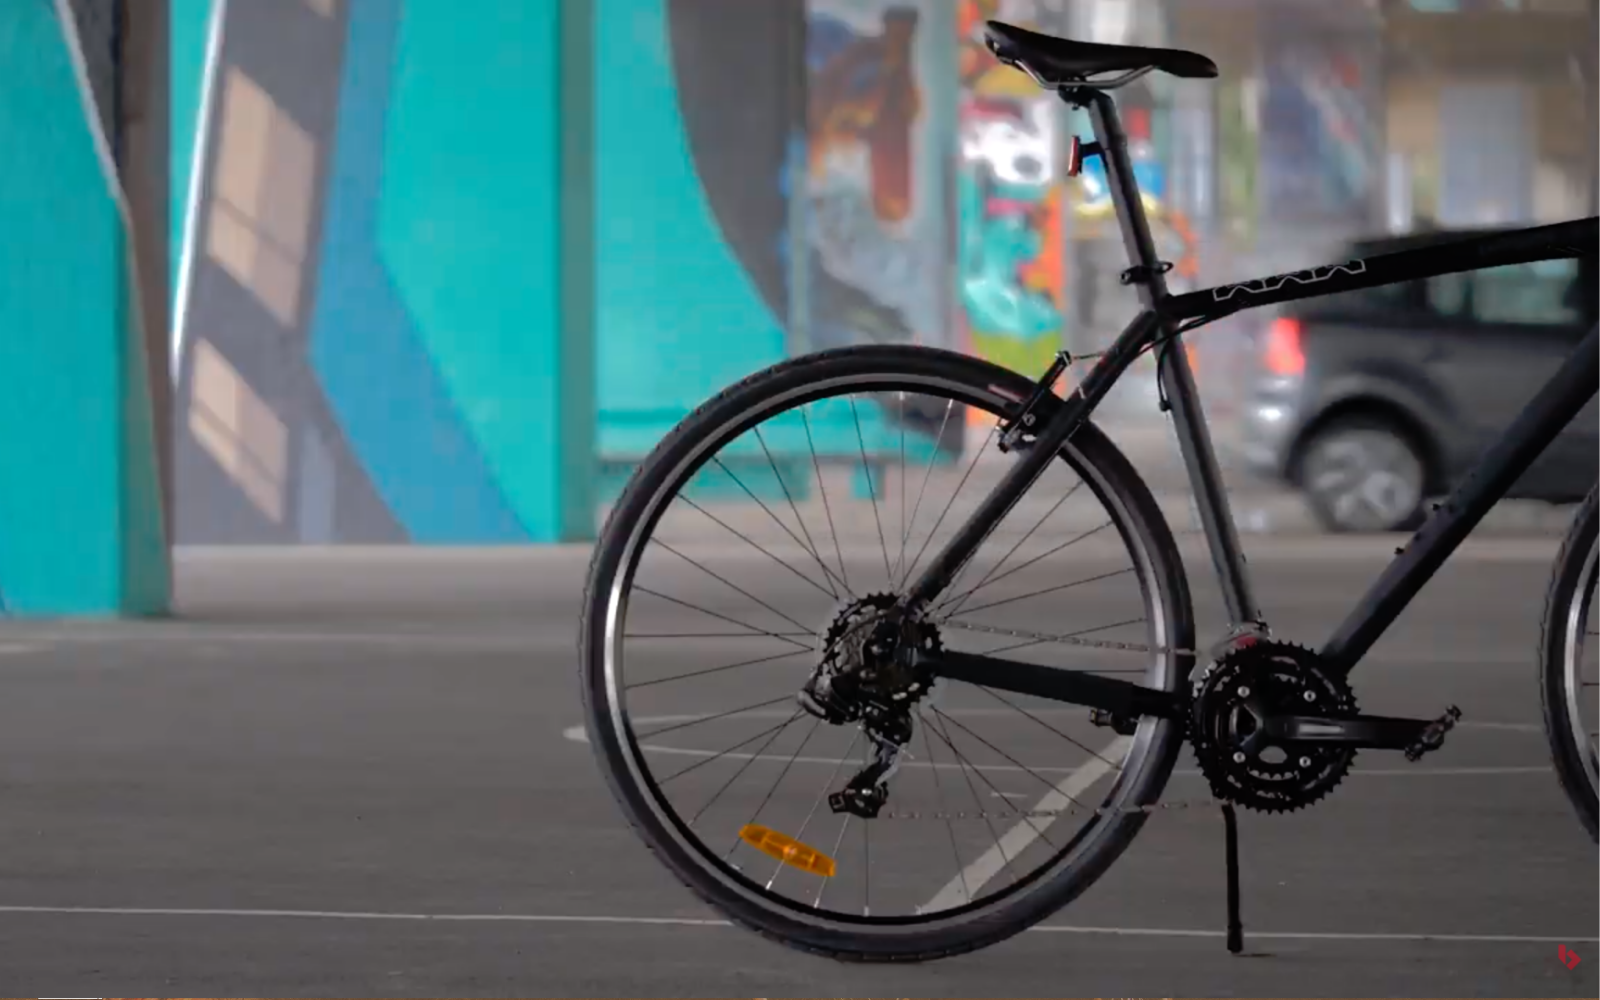 83 1 - Reid ® - Urban X0 Bike